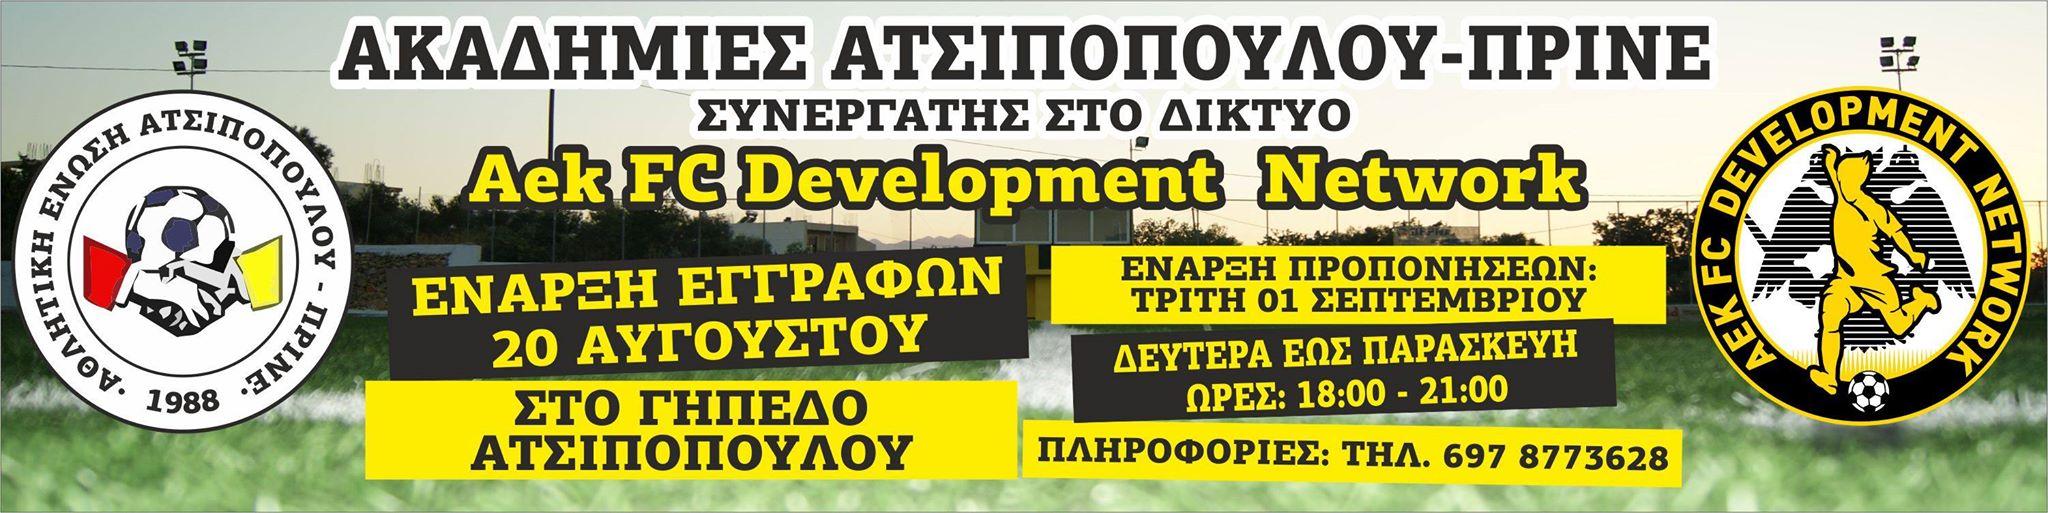 Atsipopoulo